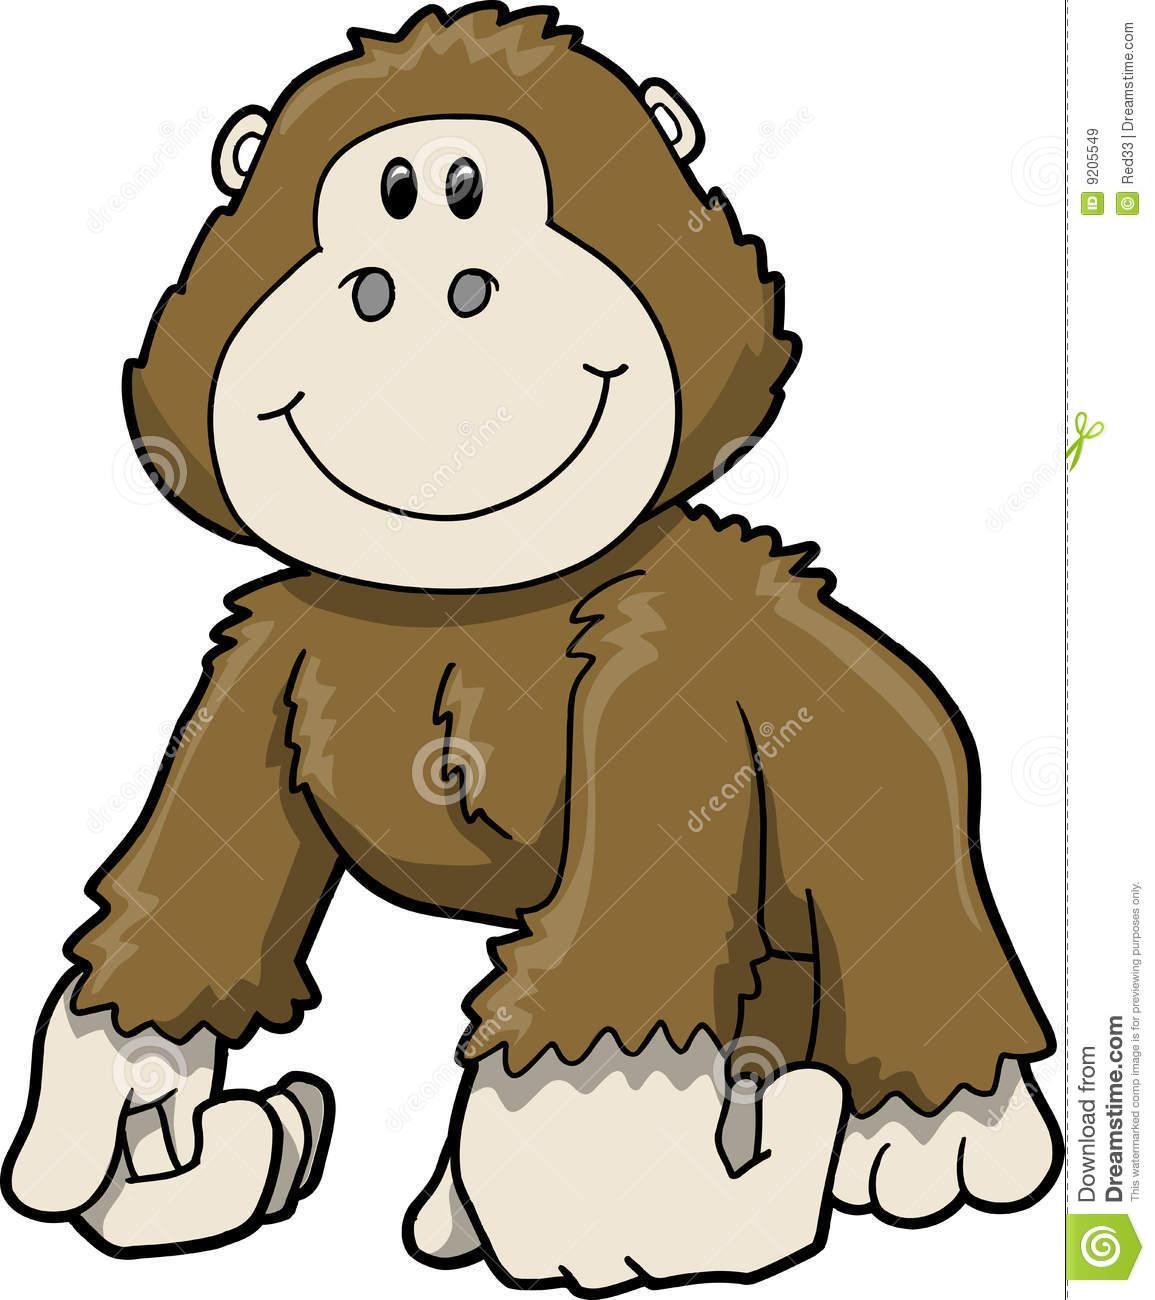 Gorilla Clip Art Images | Clipart Panda - Free Clipart Images